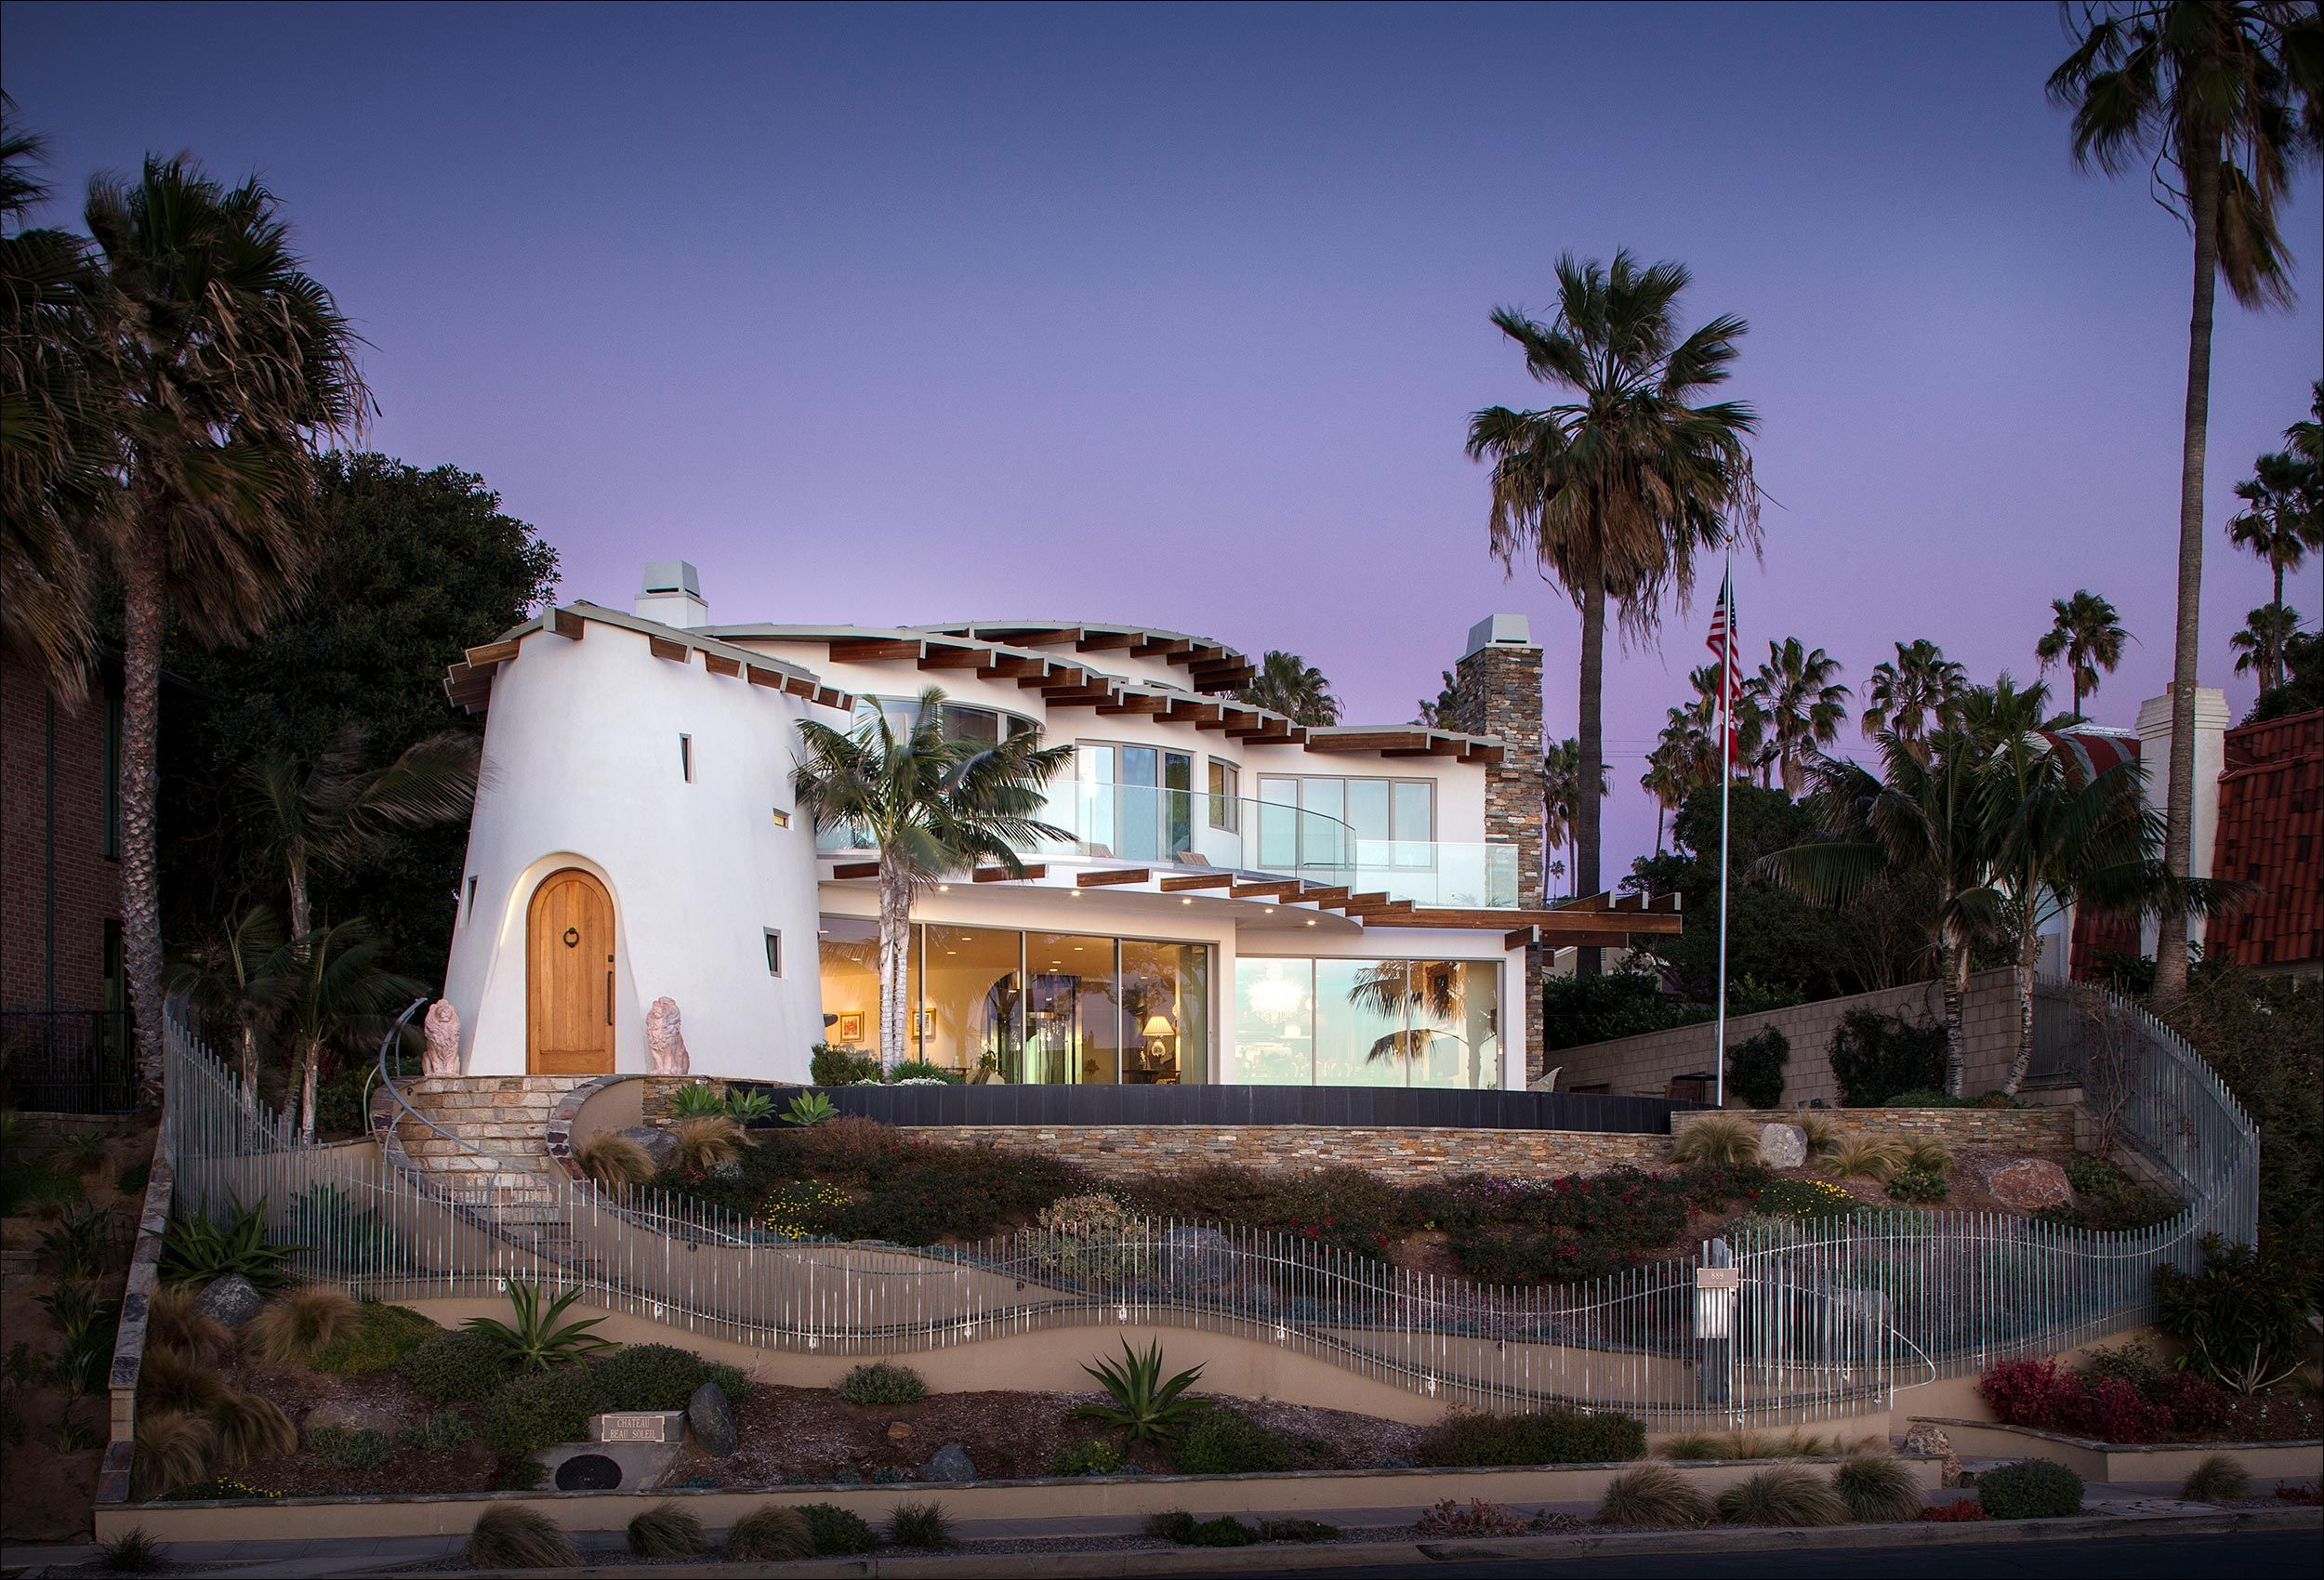 SanDiego_Home&Garden_SunsetCliffs_ResidentialPhotography.jpg